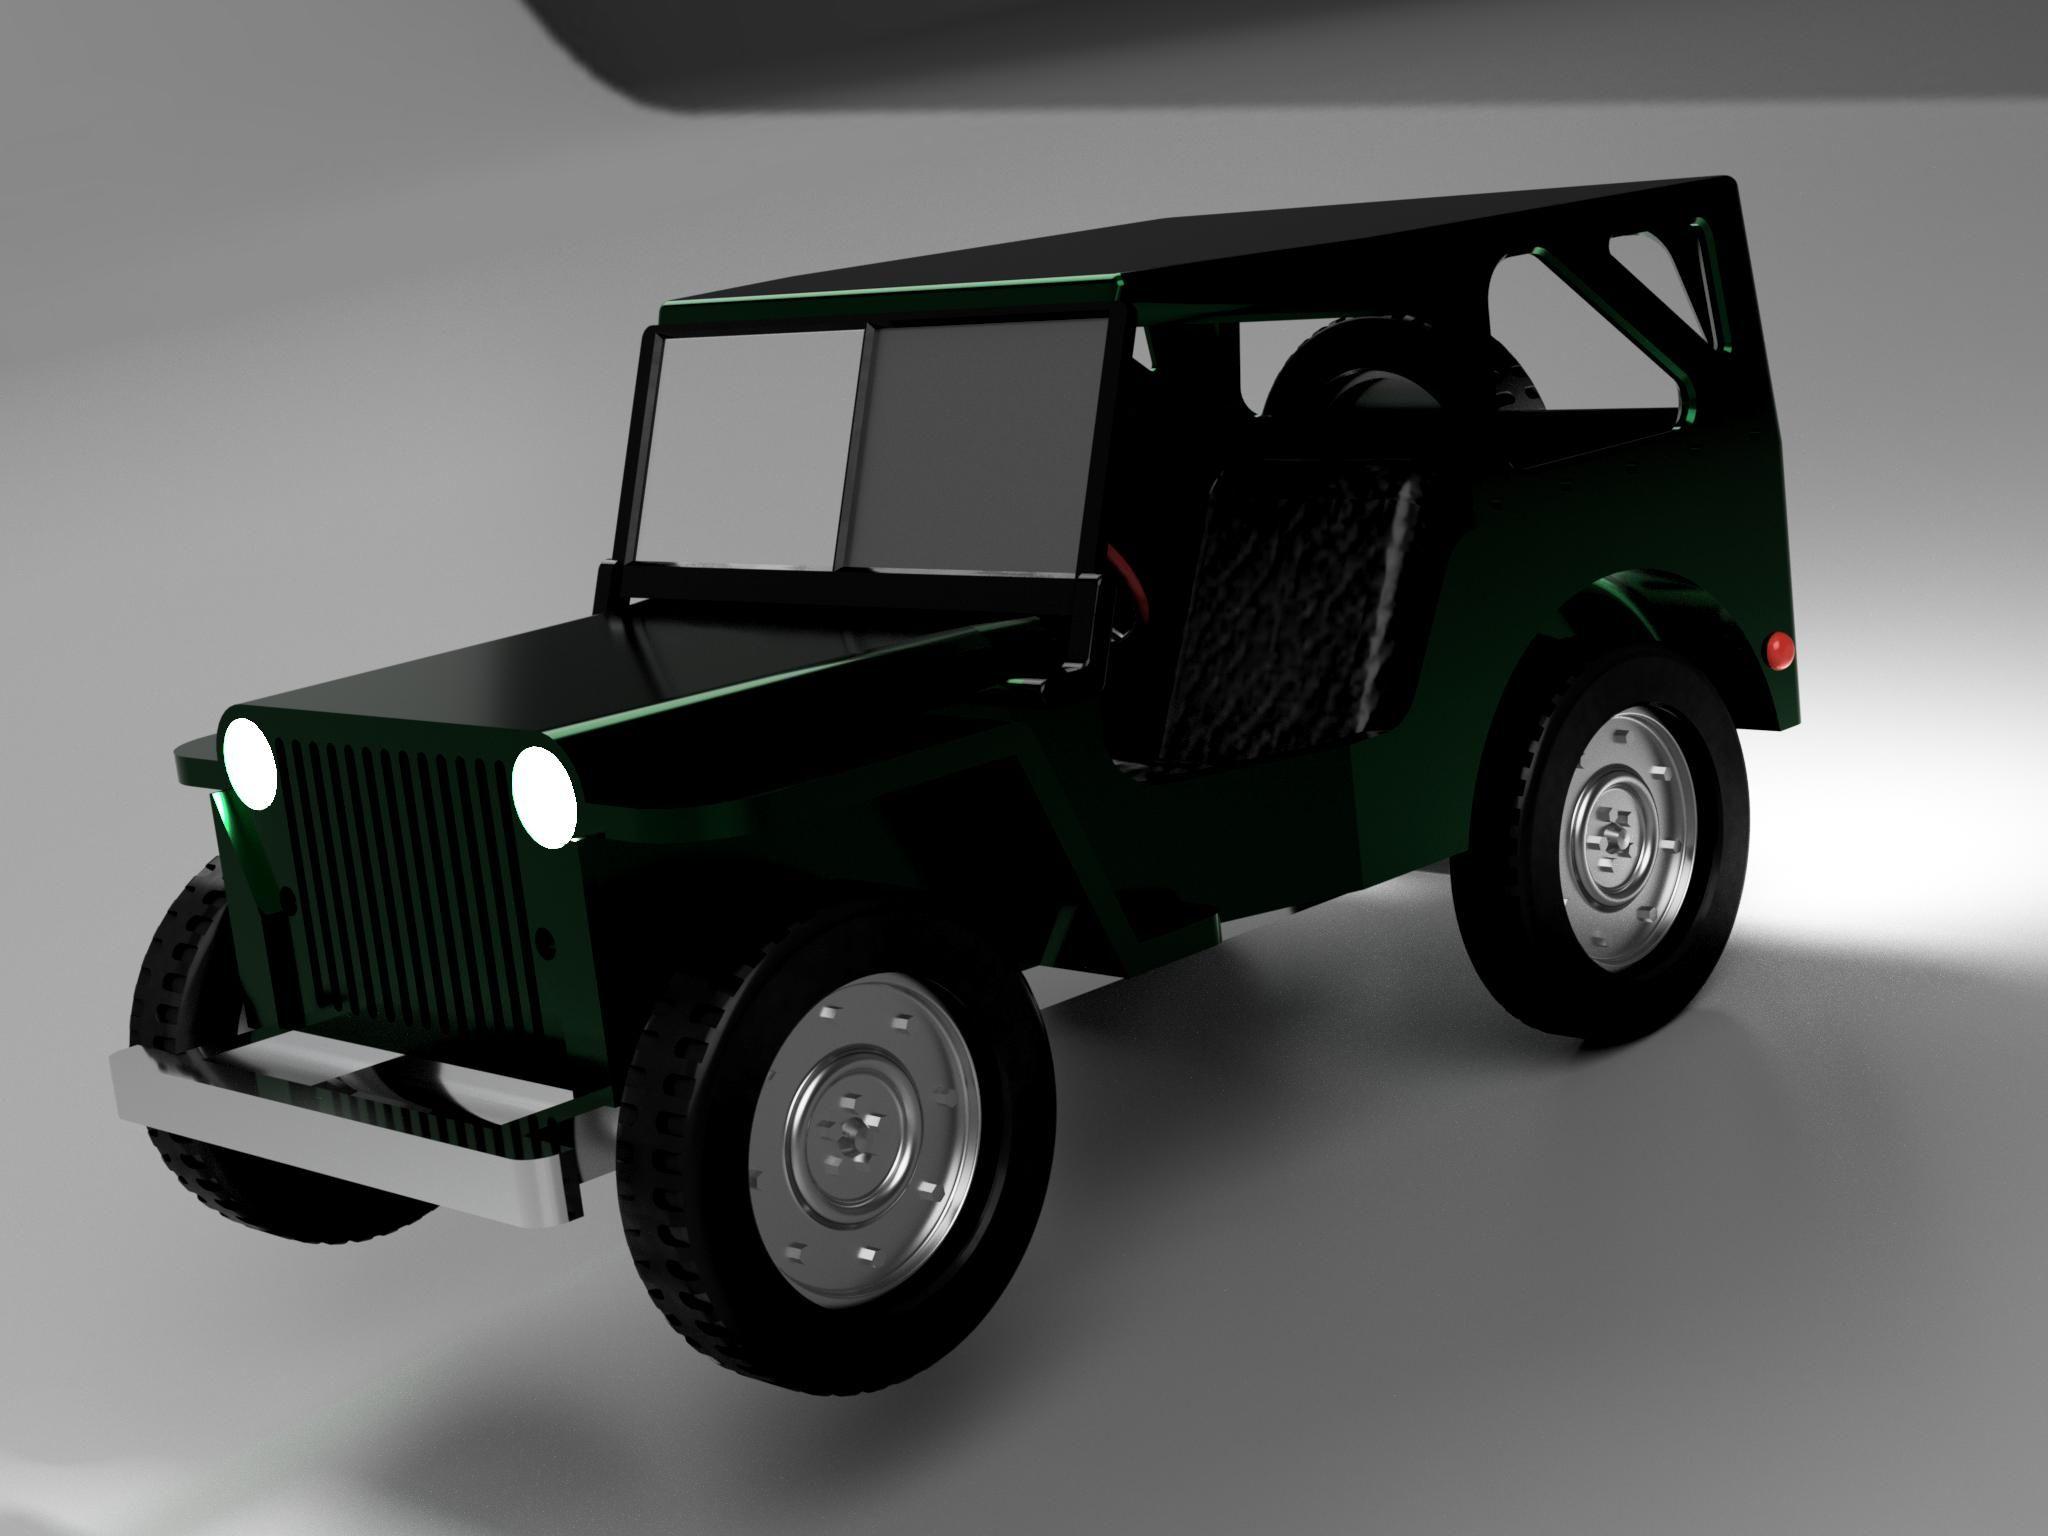 1-jeep-3500-3500